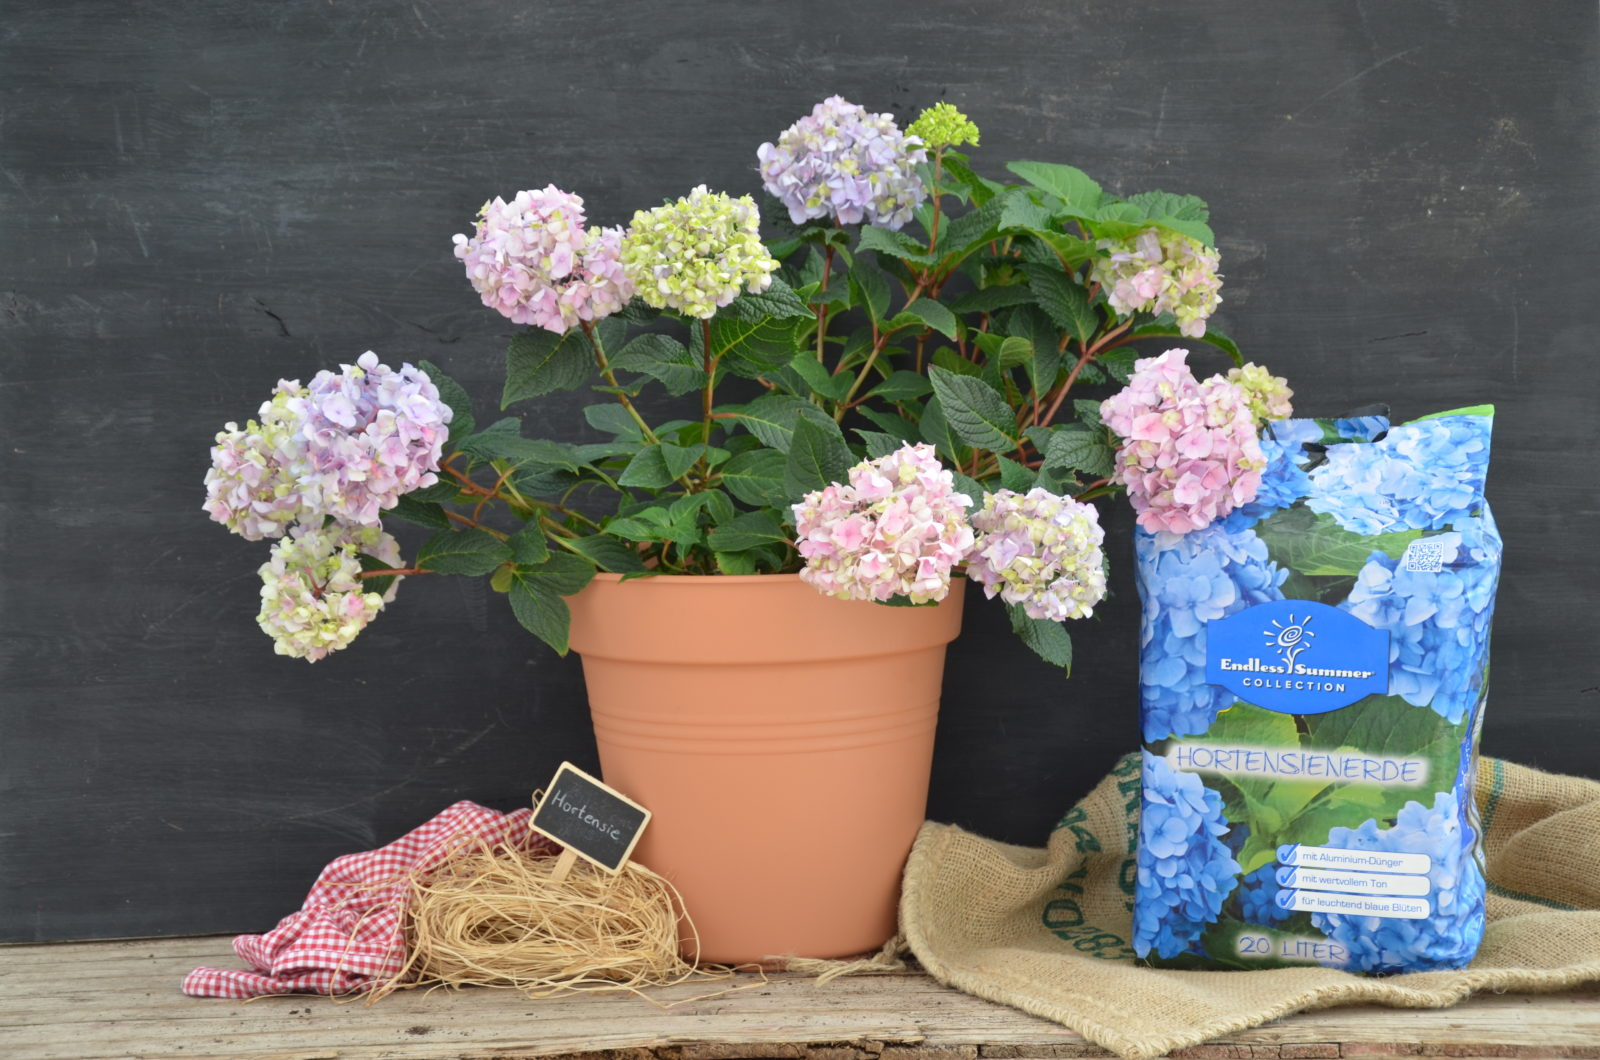 hortensien pflanzen standort umpflanzen begleitpflanzen plantura. Black Bedroom Furniture Sets. Home Design Ideas